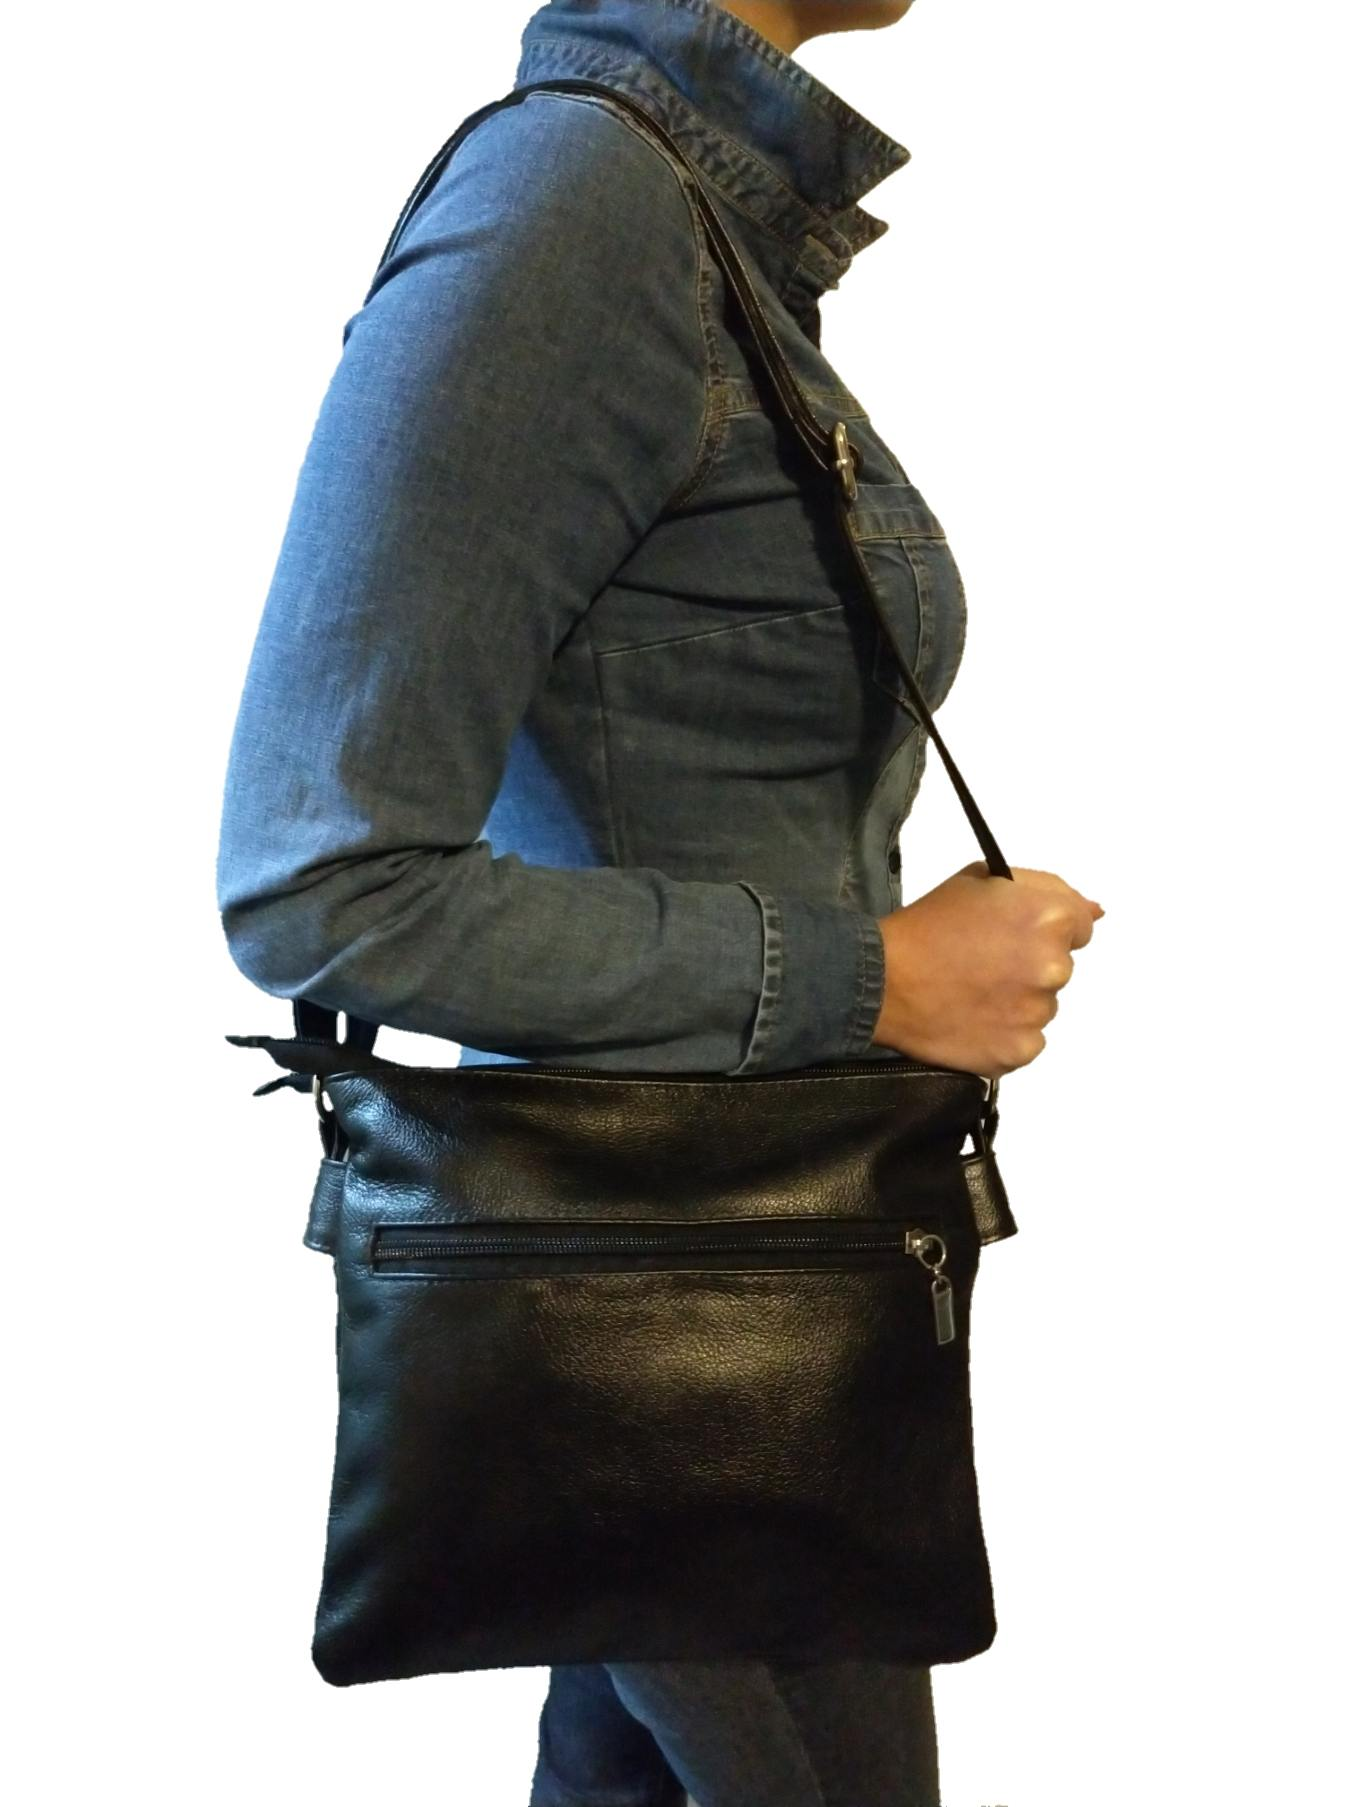 Bolsa Feminina Transversal TopGrife Couro Preto  - SAPATOWEB.COM